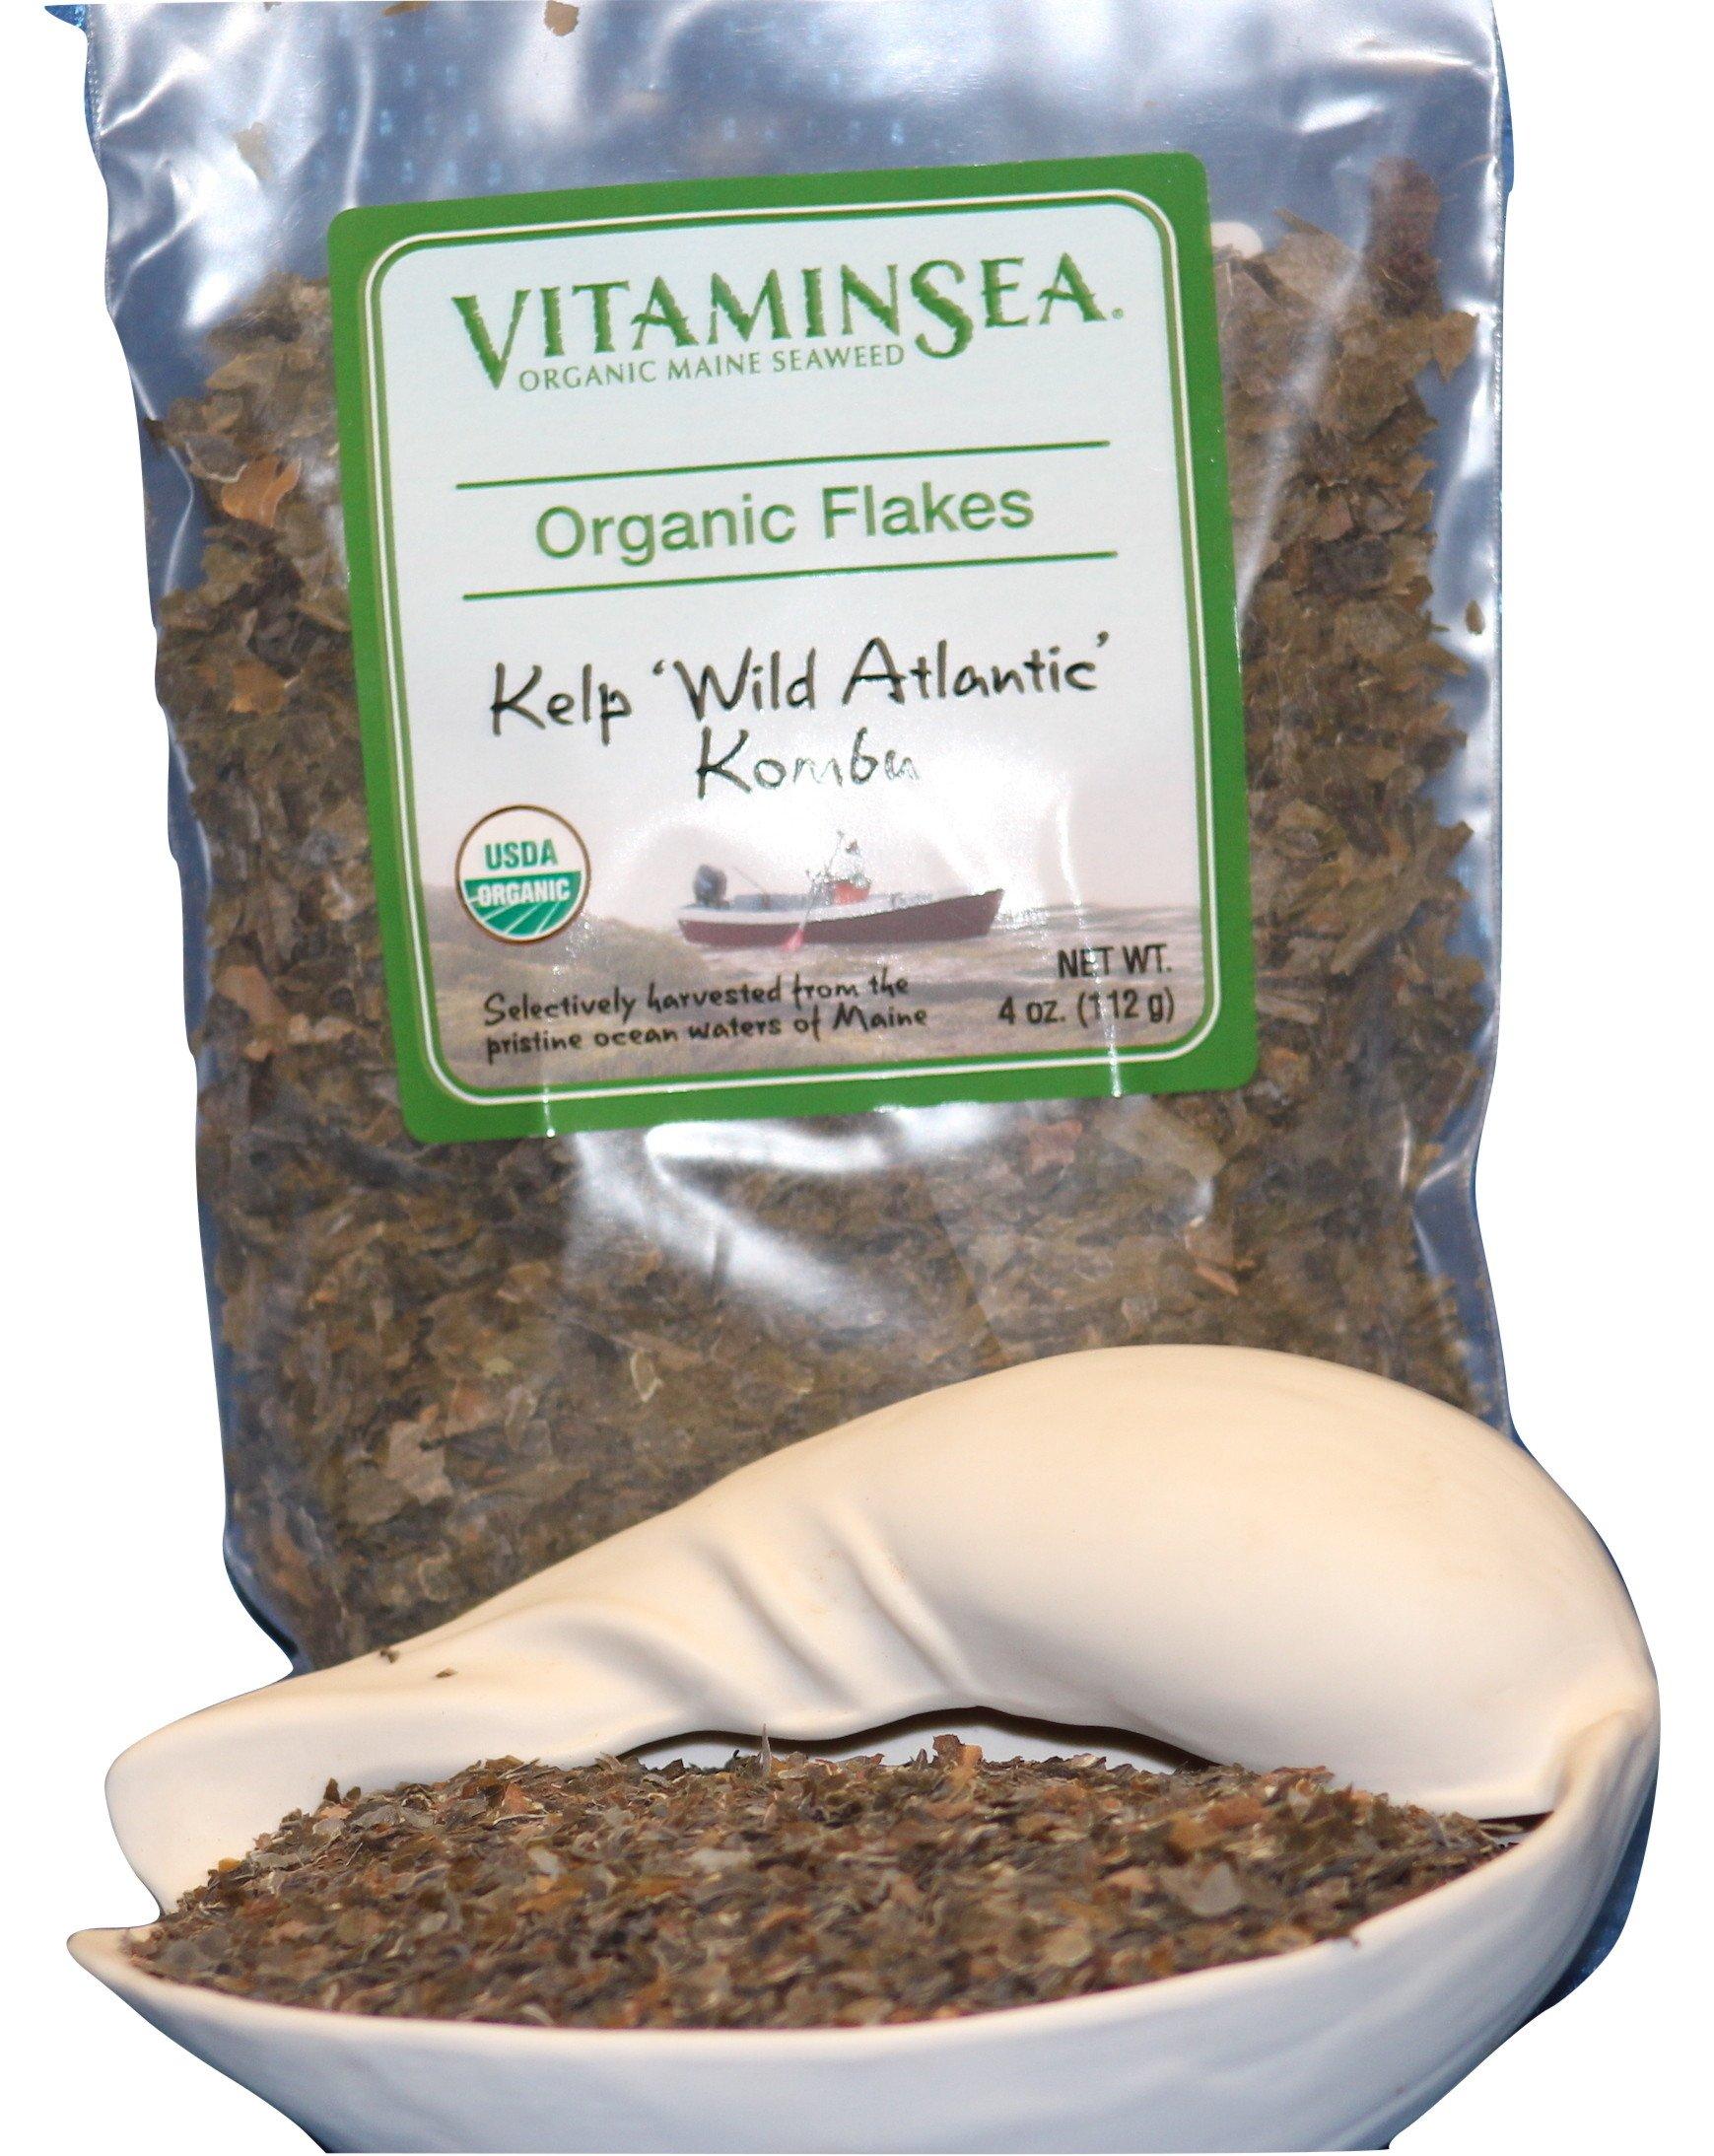 Organic Kombu Flakes Kelp Seaweed - 4 oz bag - USDA & Vegan Certified - Kosher - Hand Harvested from the Atlantic Ocean Maine Coast - Sun Dried Raw and Wild Sea Vegetables VitaminSea (Kombu Fks 4oz)